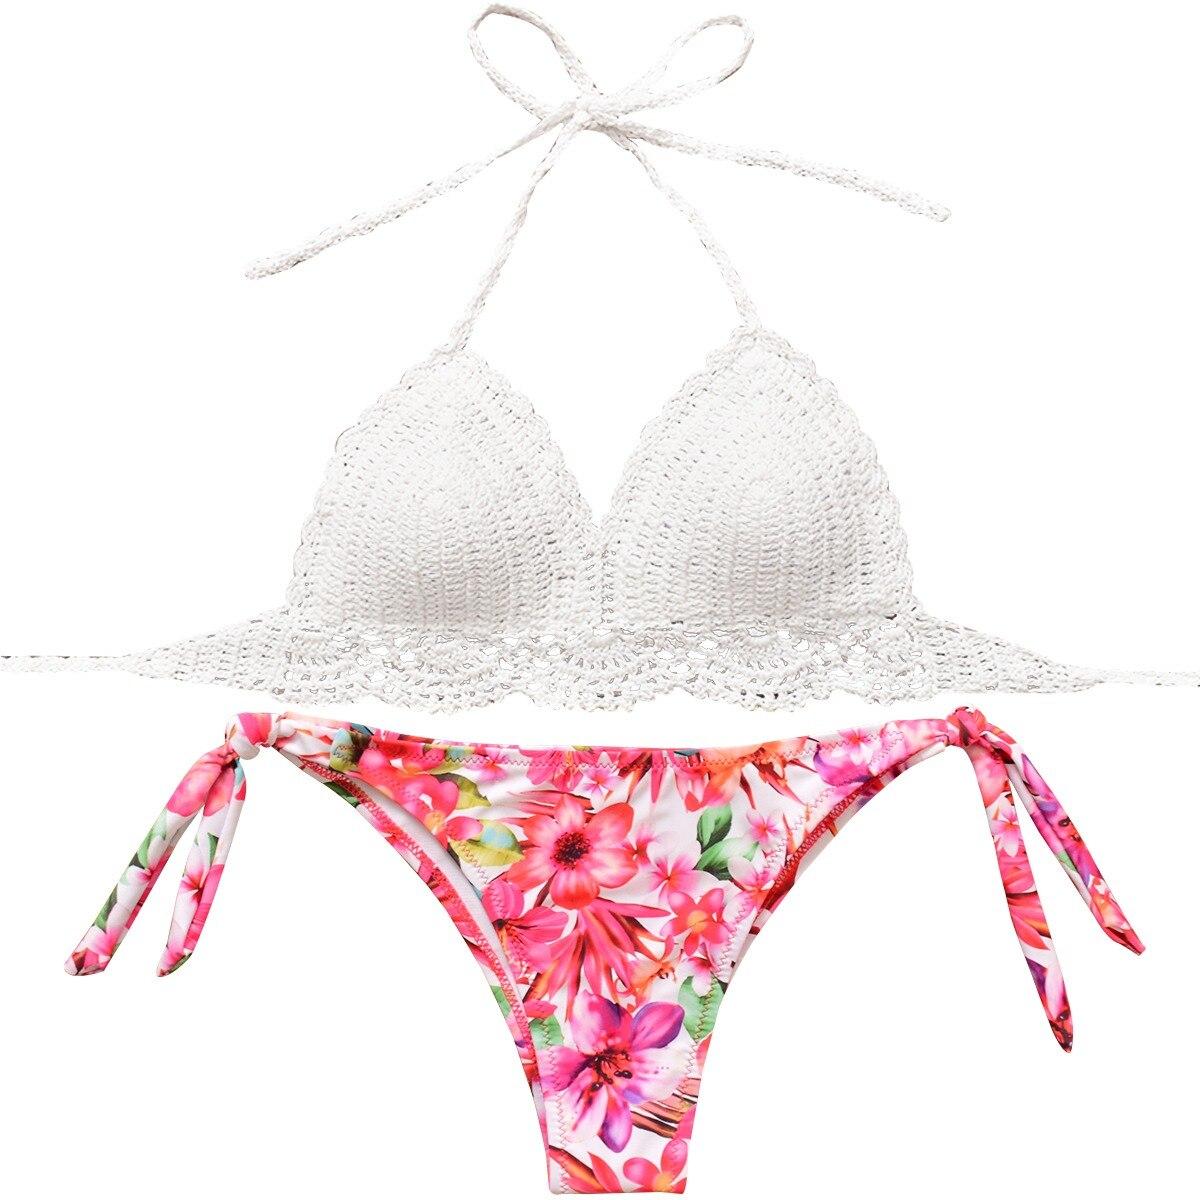 53bb812408 Crochet Bikini set Women Handmade Knitted Swimsuit Sexy Floral Print Bikinis  mujer Swimwear Bathing Suit biquinis